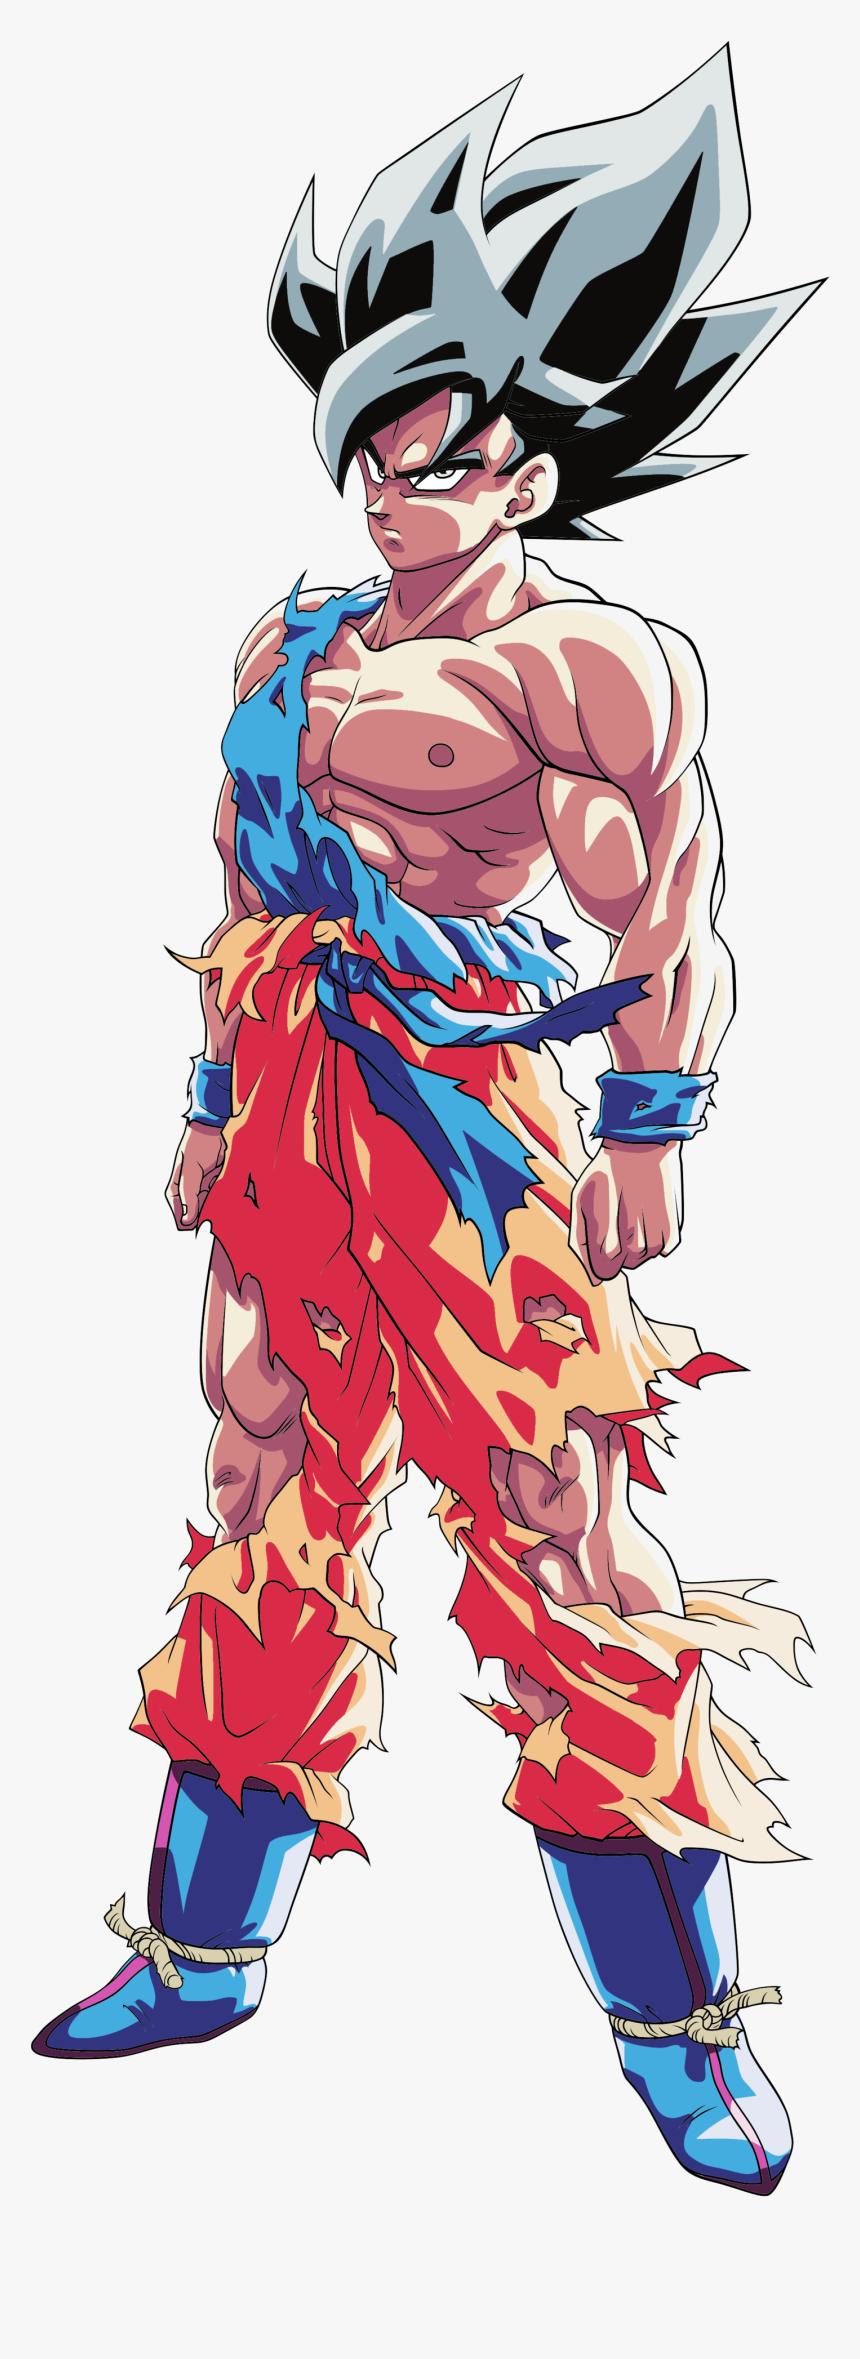 Ultra Instinct Goku Wallpaper Iphone Wallskid Goku Super Saiyan Dbz Hd Png Download Transparent Png Image Pngitem